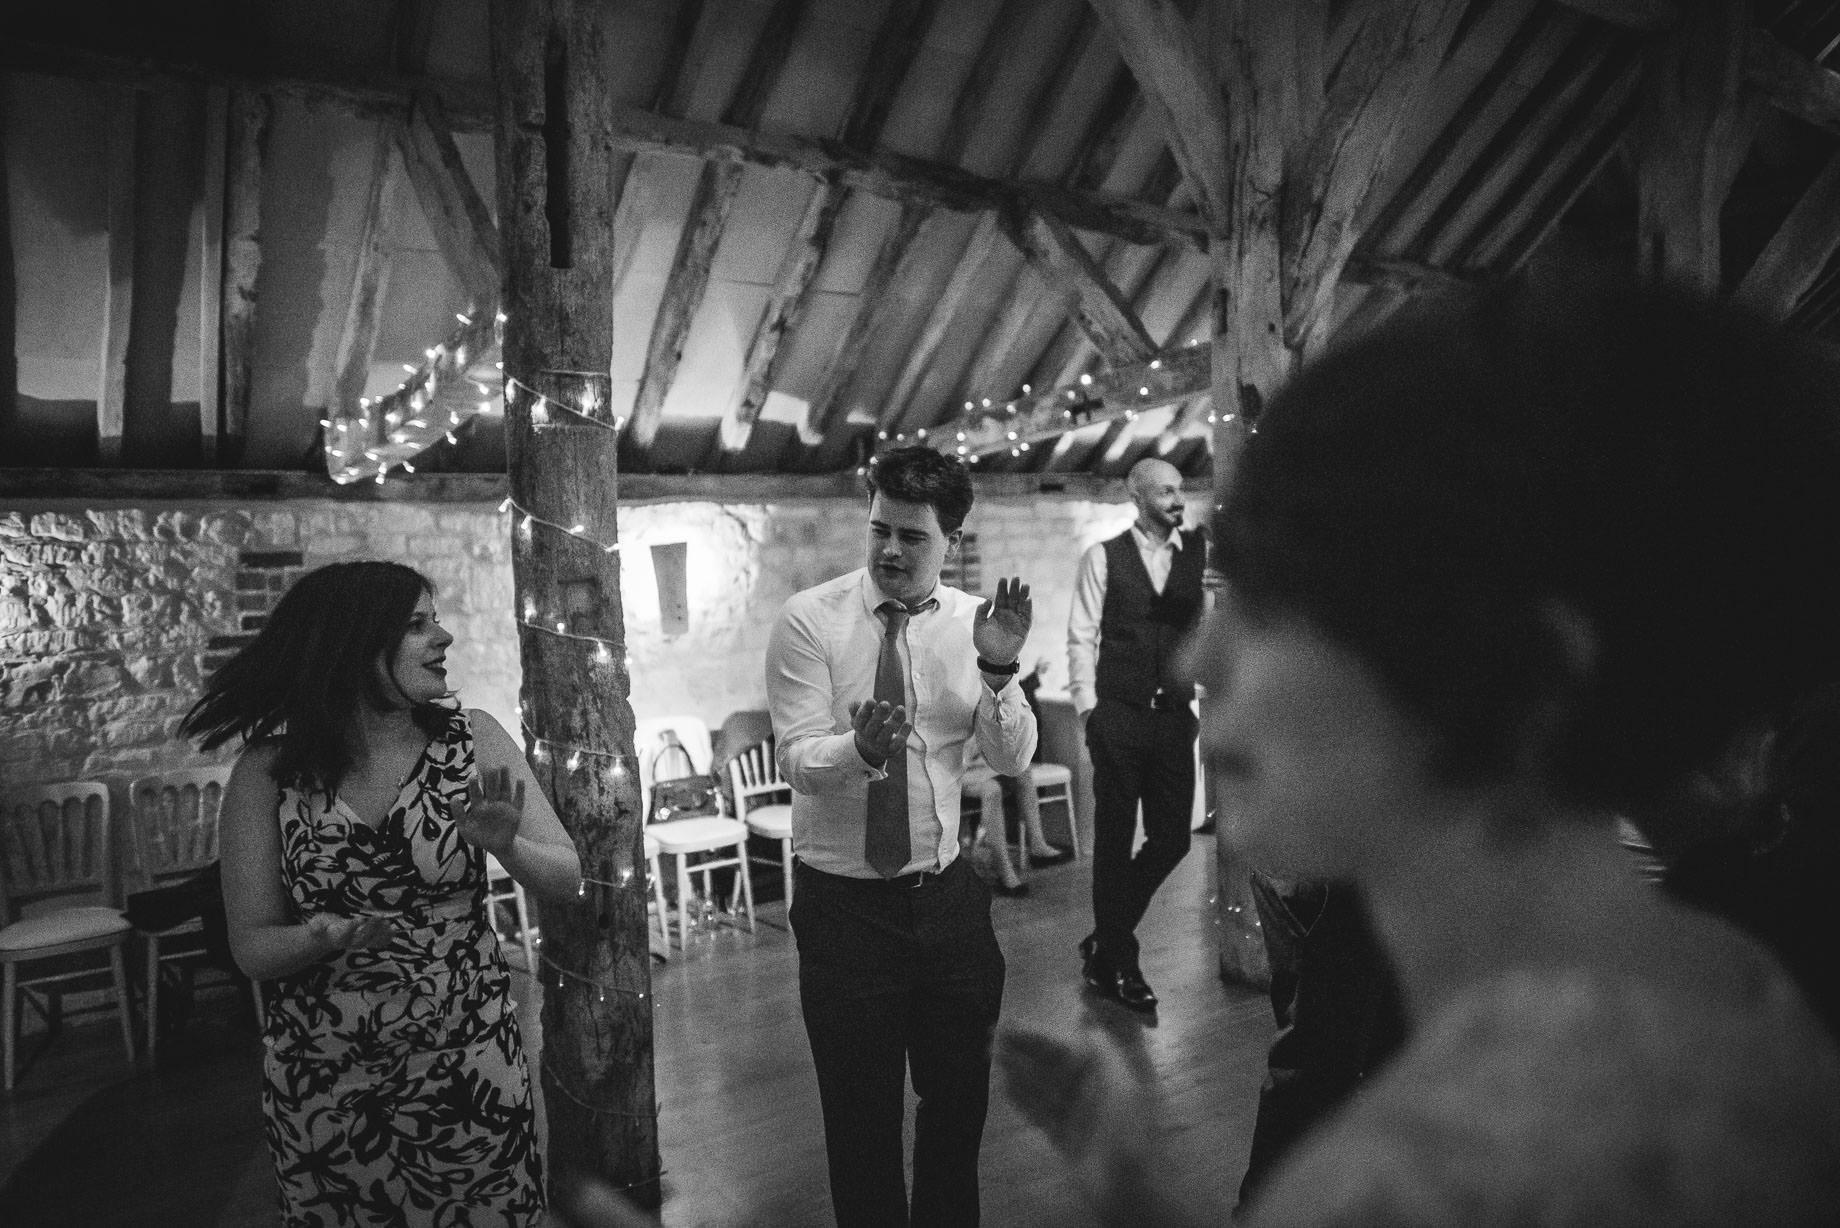 bury-court-barn-wedding-photography-guy-collier-photography-nadia-tom-179-of-184